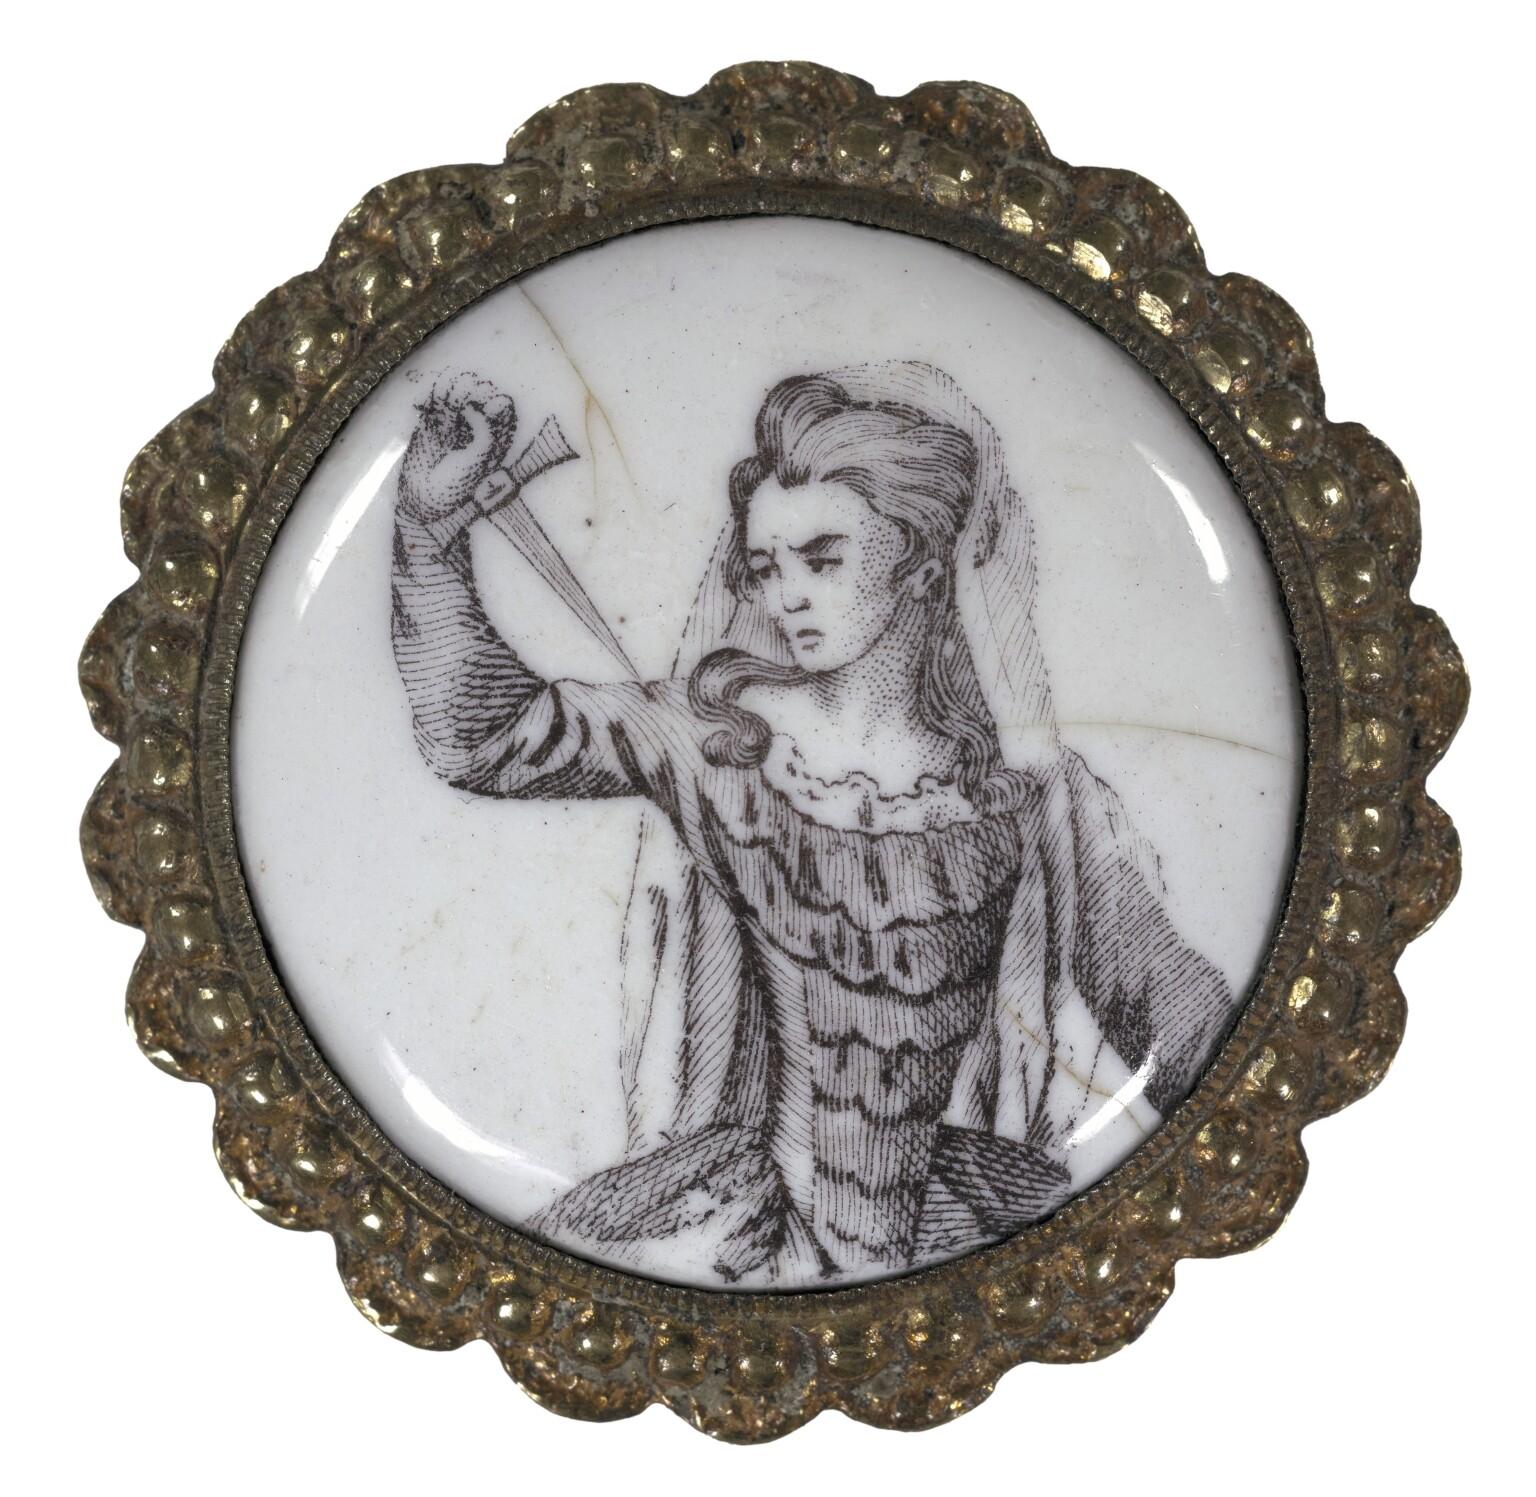 drawing of woman in circular frame